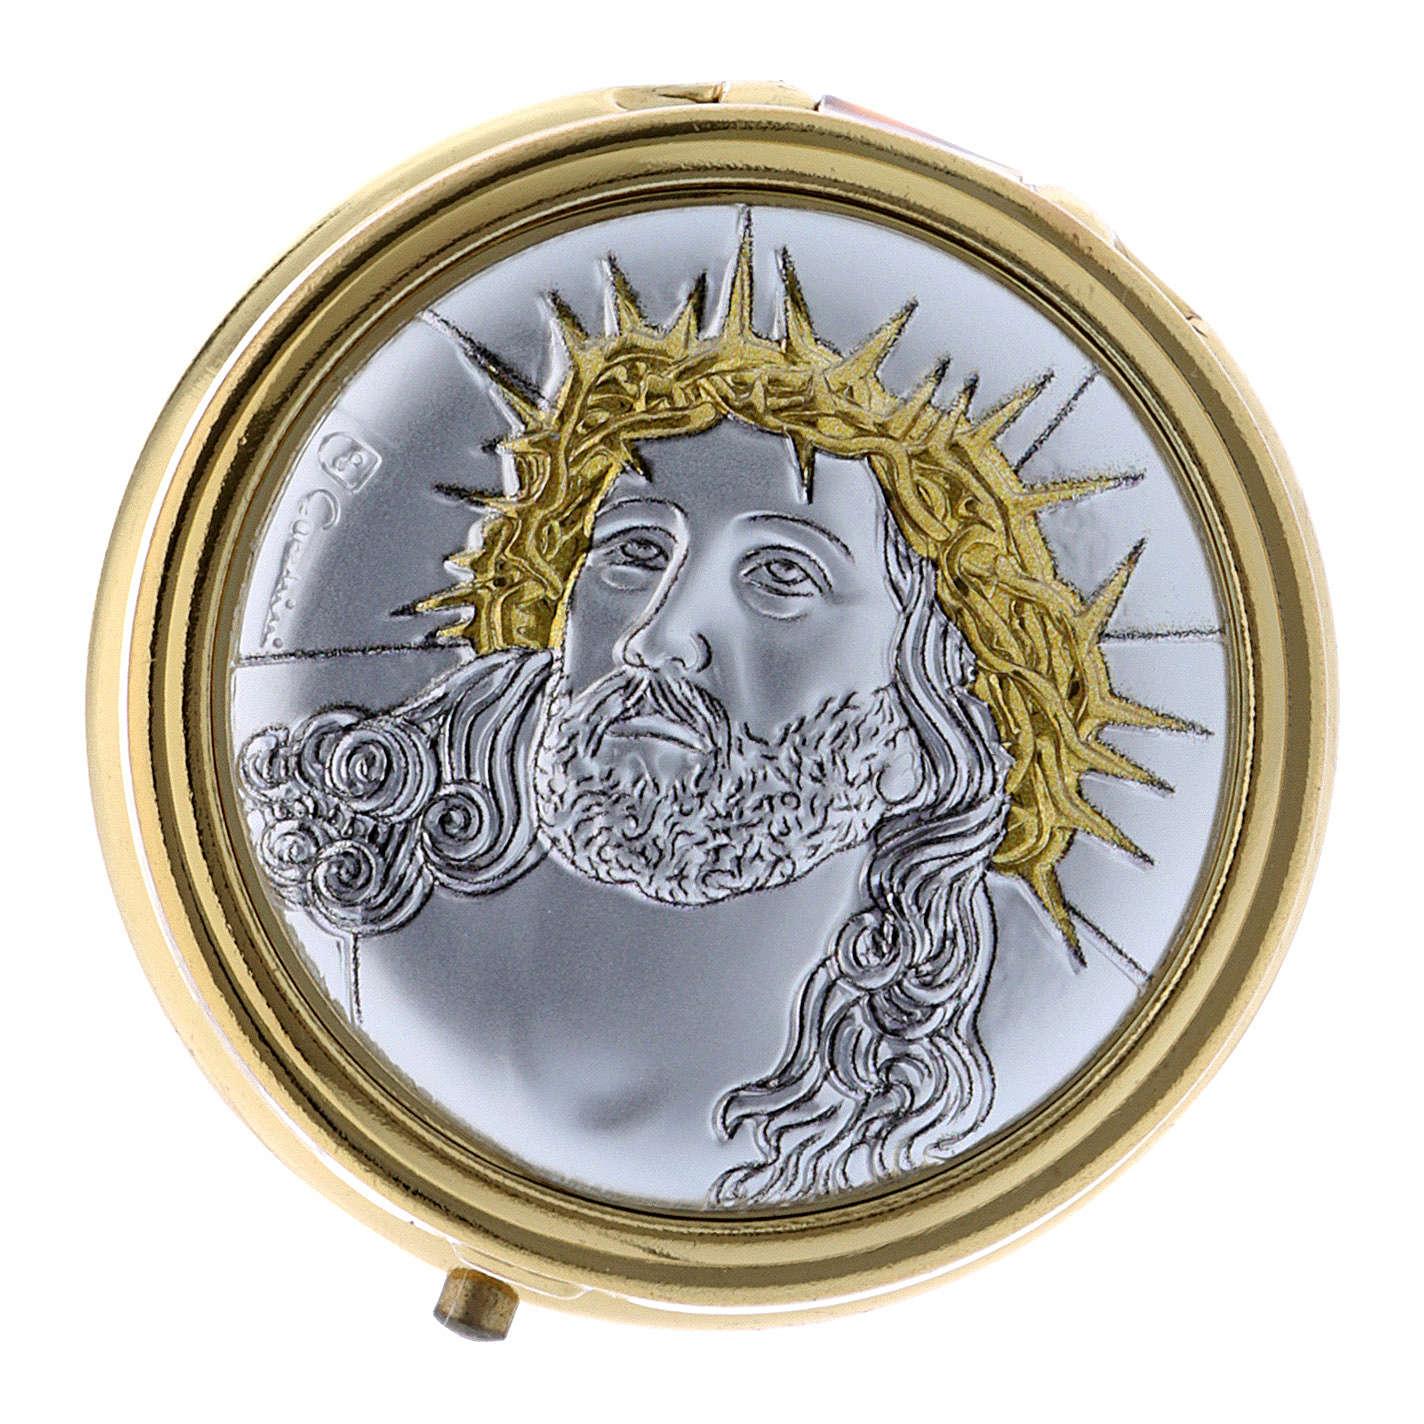 Teca para hostias Ecce Homo metal plancha aluminio detalles oro 5 cm 3